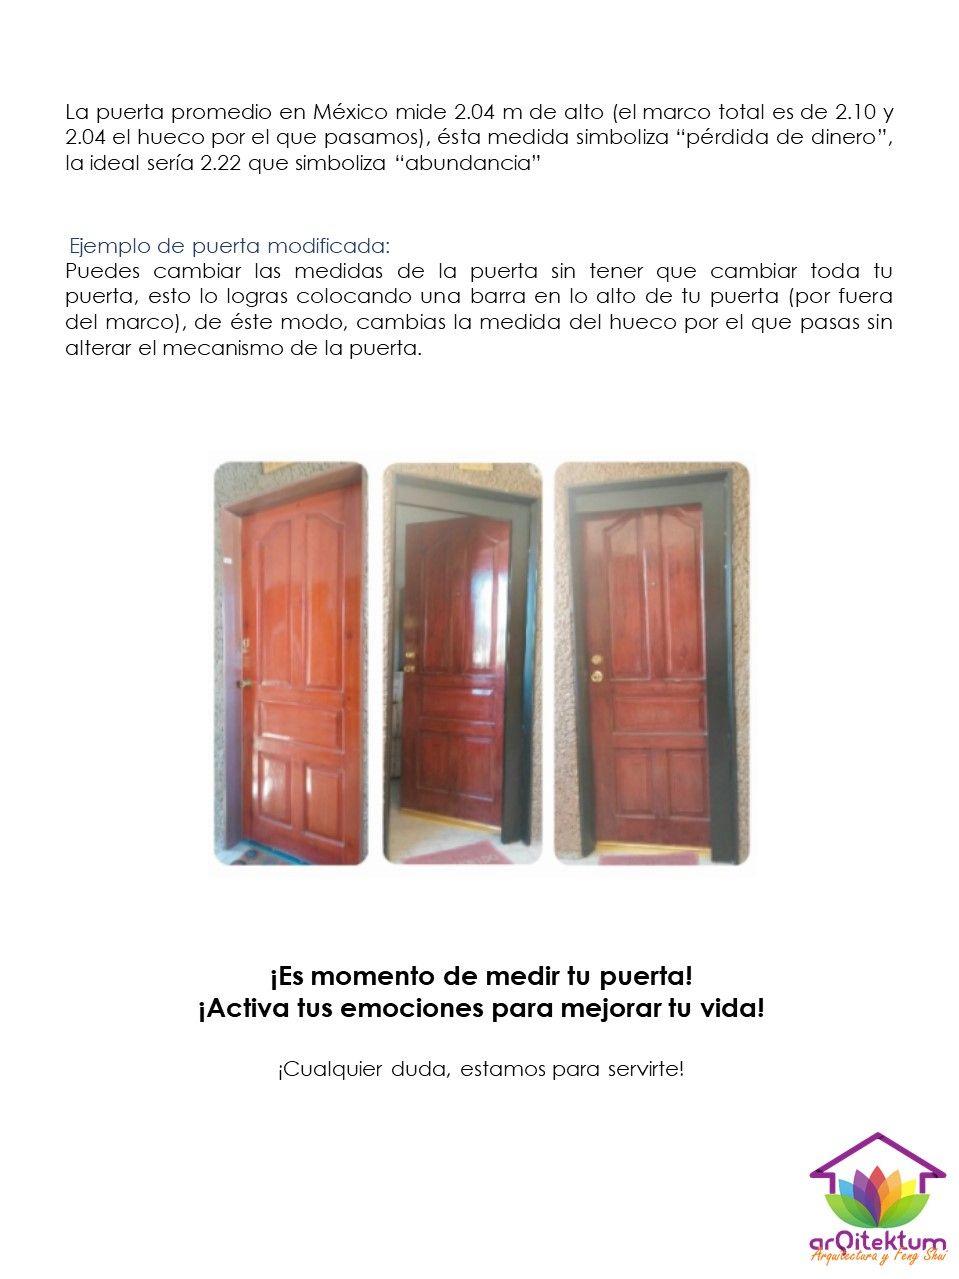 Pin de Difusion Arqitektum en cambio altura de puerta | Pinterest ...